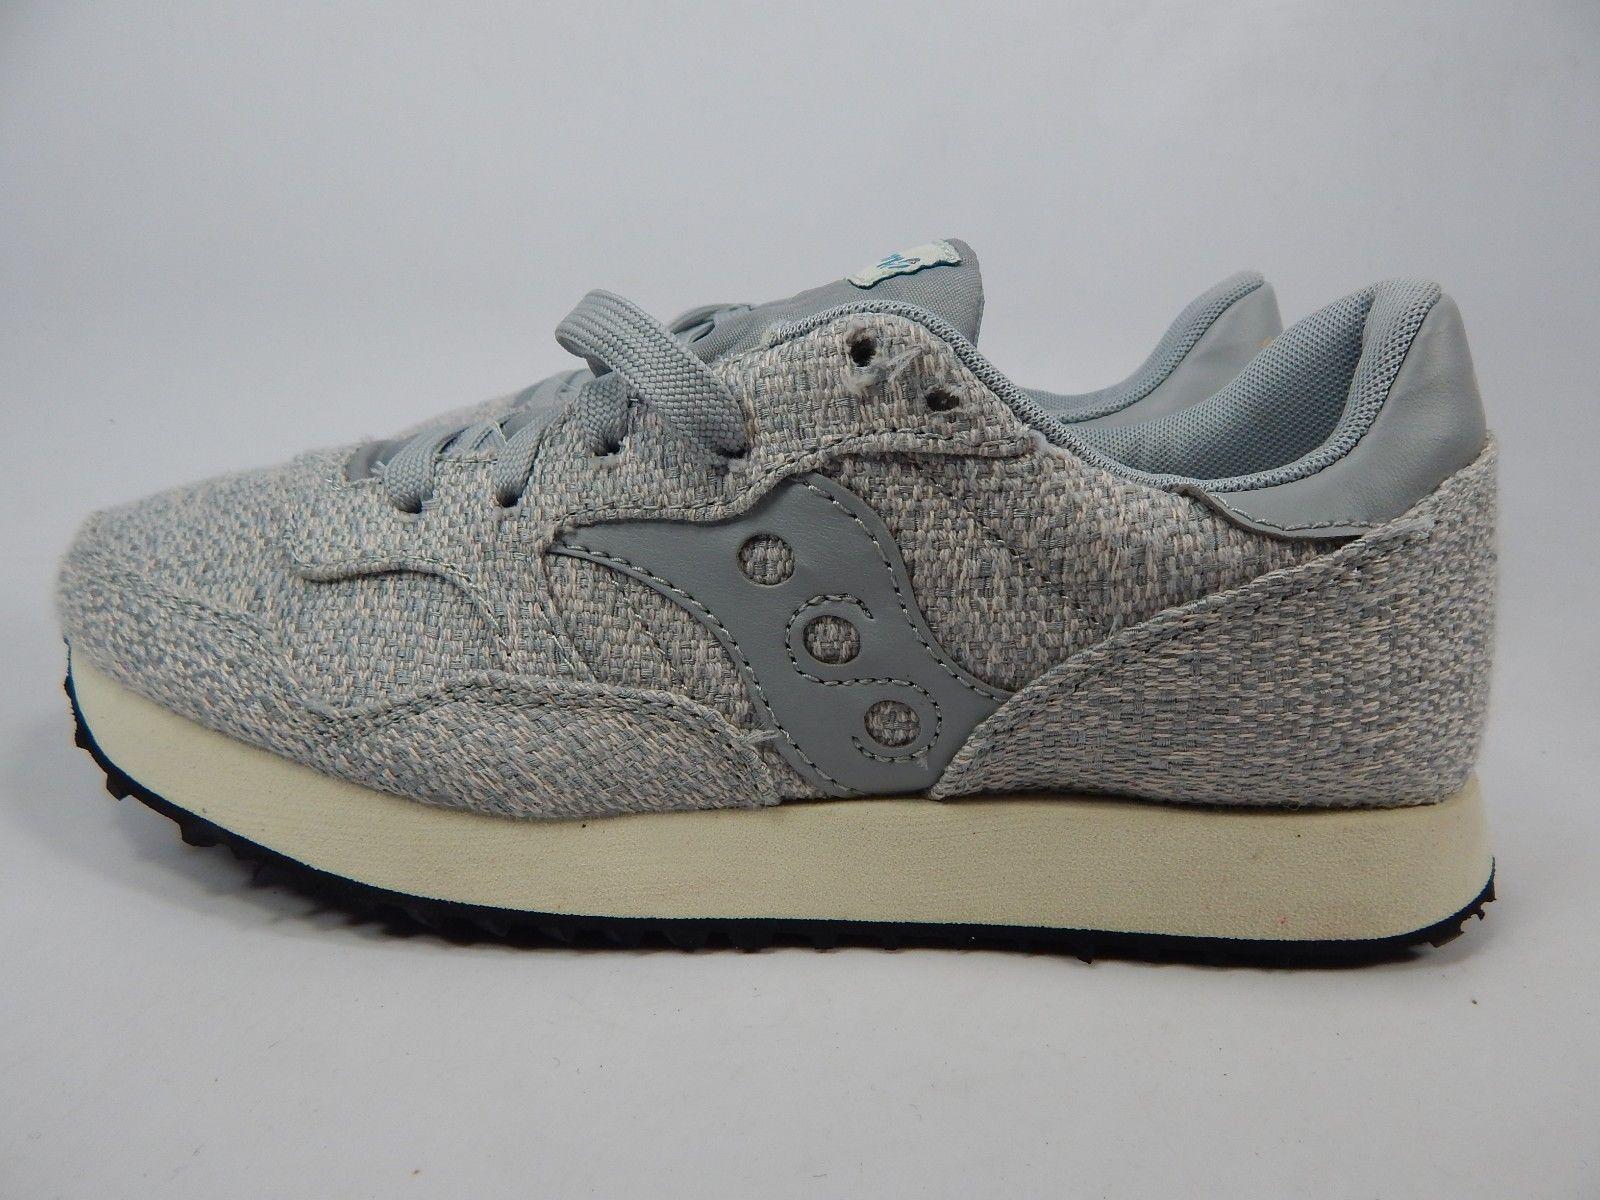 Saucony DXN Trainer CL Original S60359-2 Womens Running Shoes Size 7 M (B) EU 38